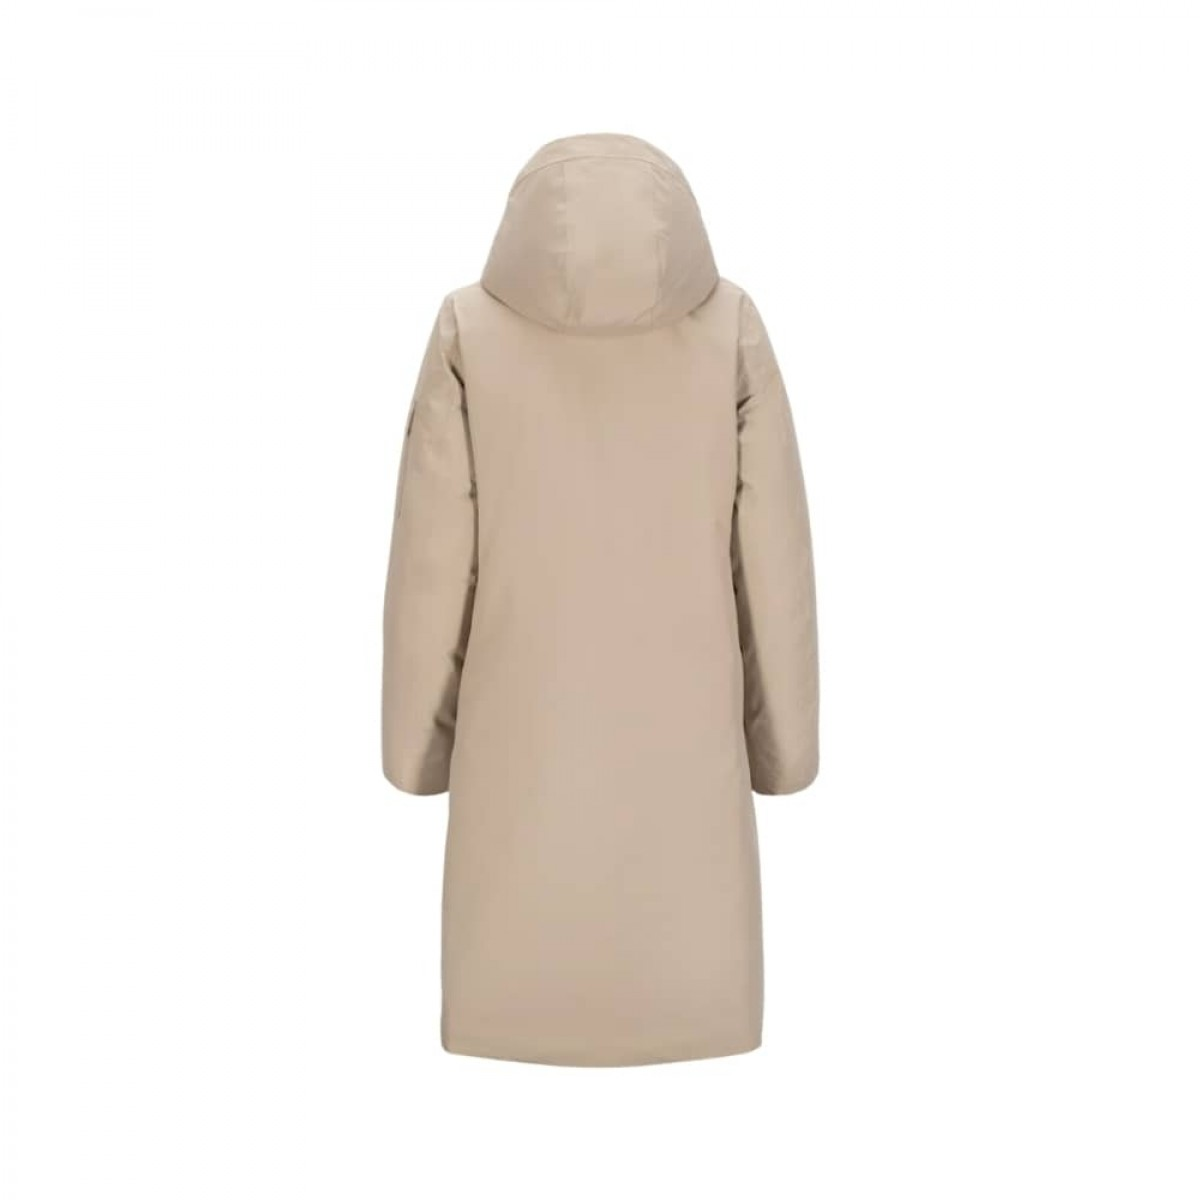 bjorli jacket - beige - ryg